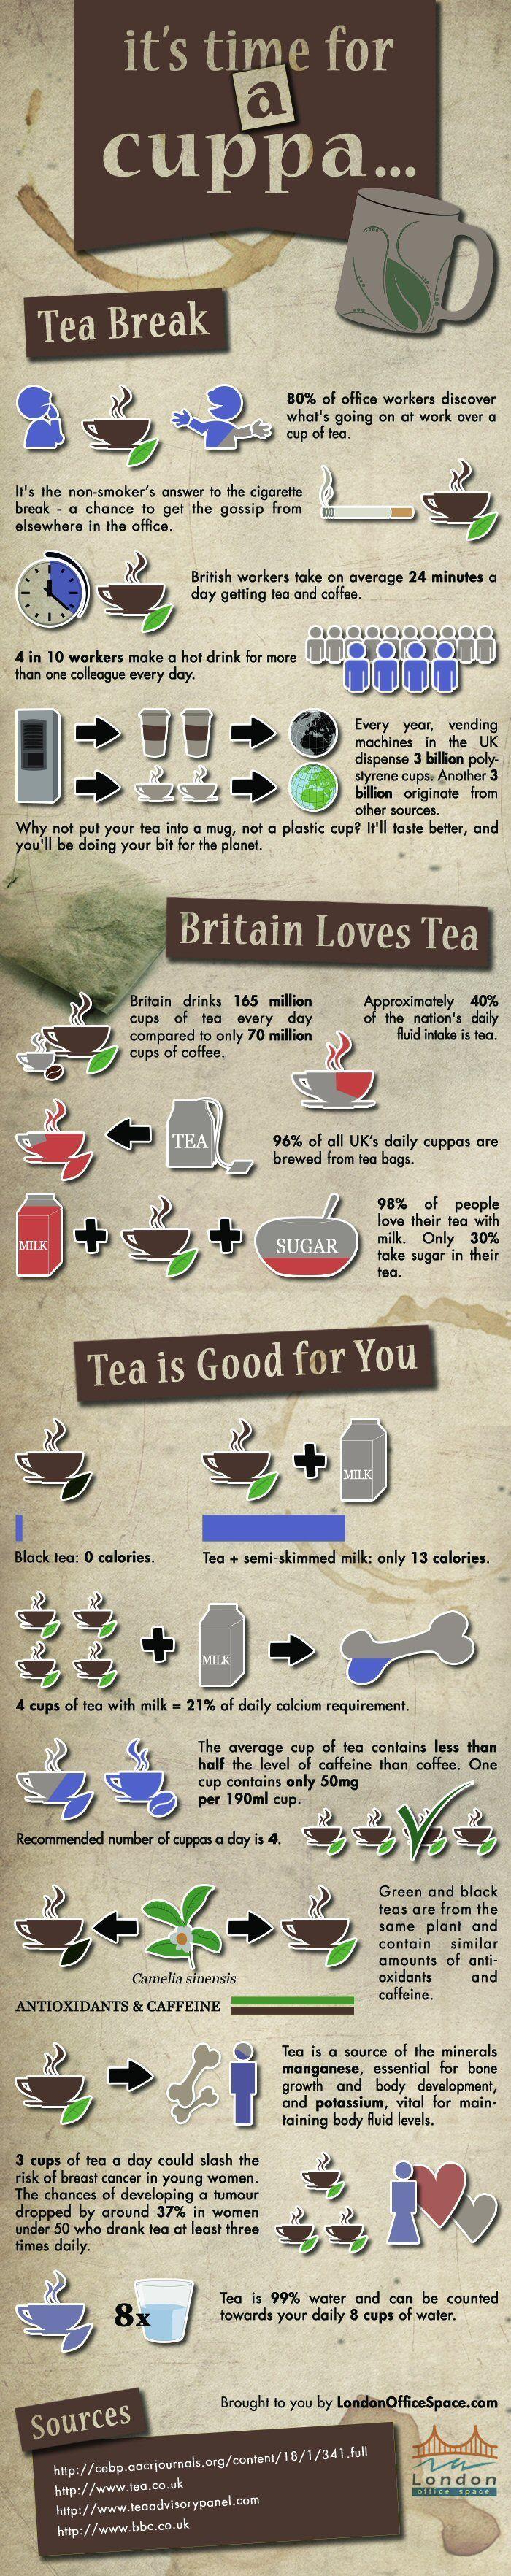 Reasons to Love Tea...